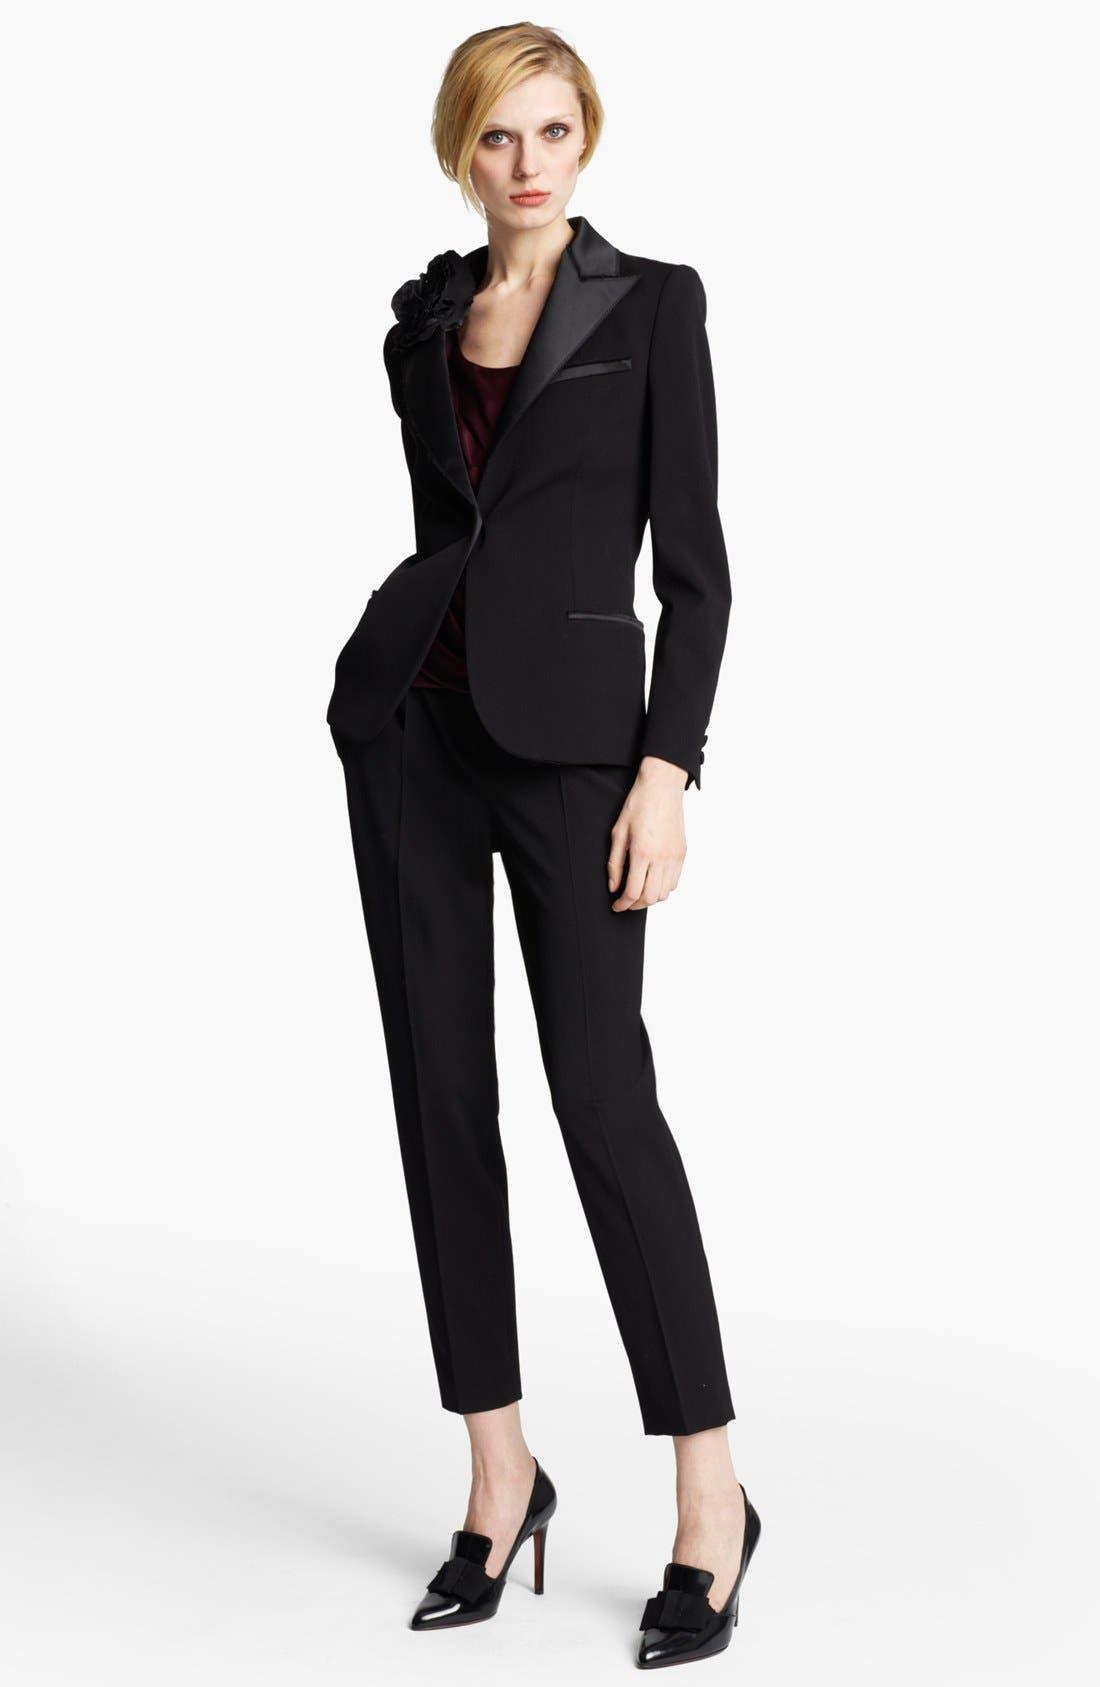 Alternate Image 1 Selected - Lanvin Satin Lapel Tuxedo Jacket